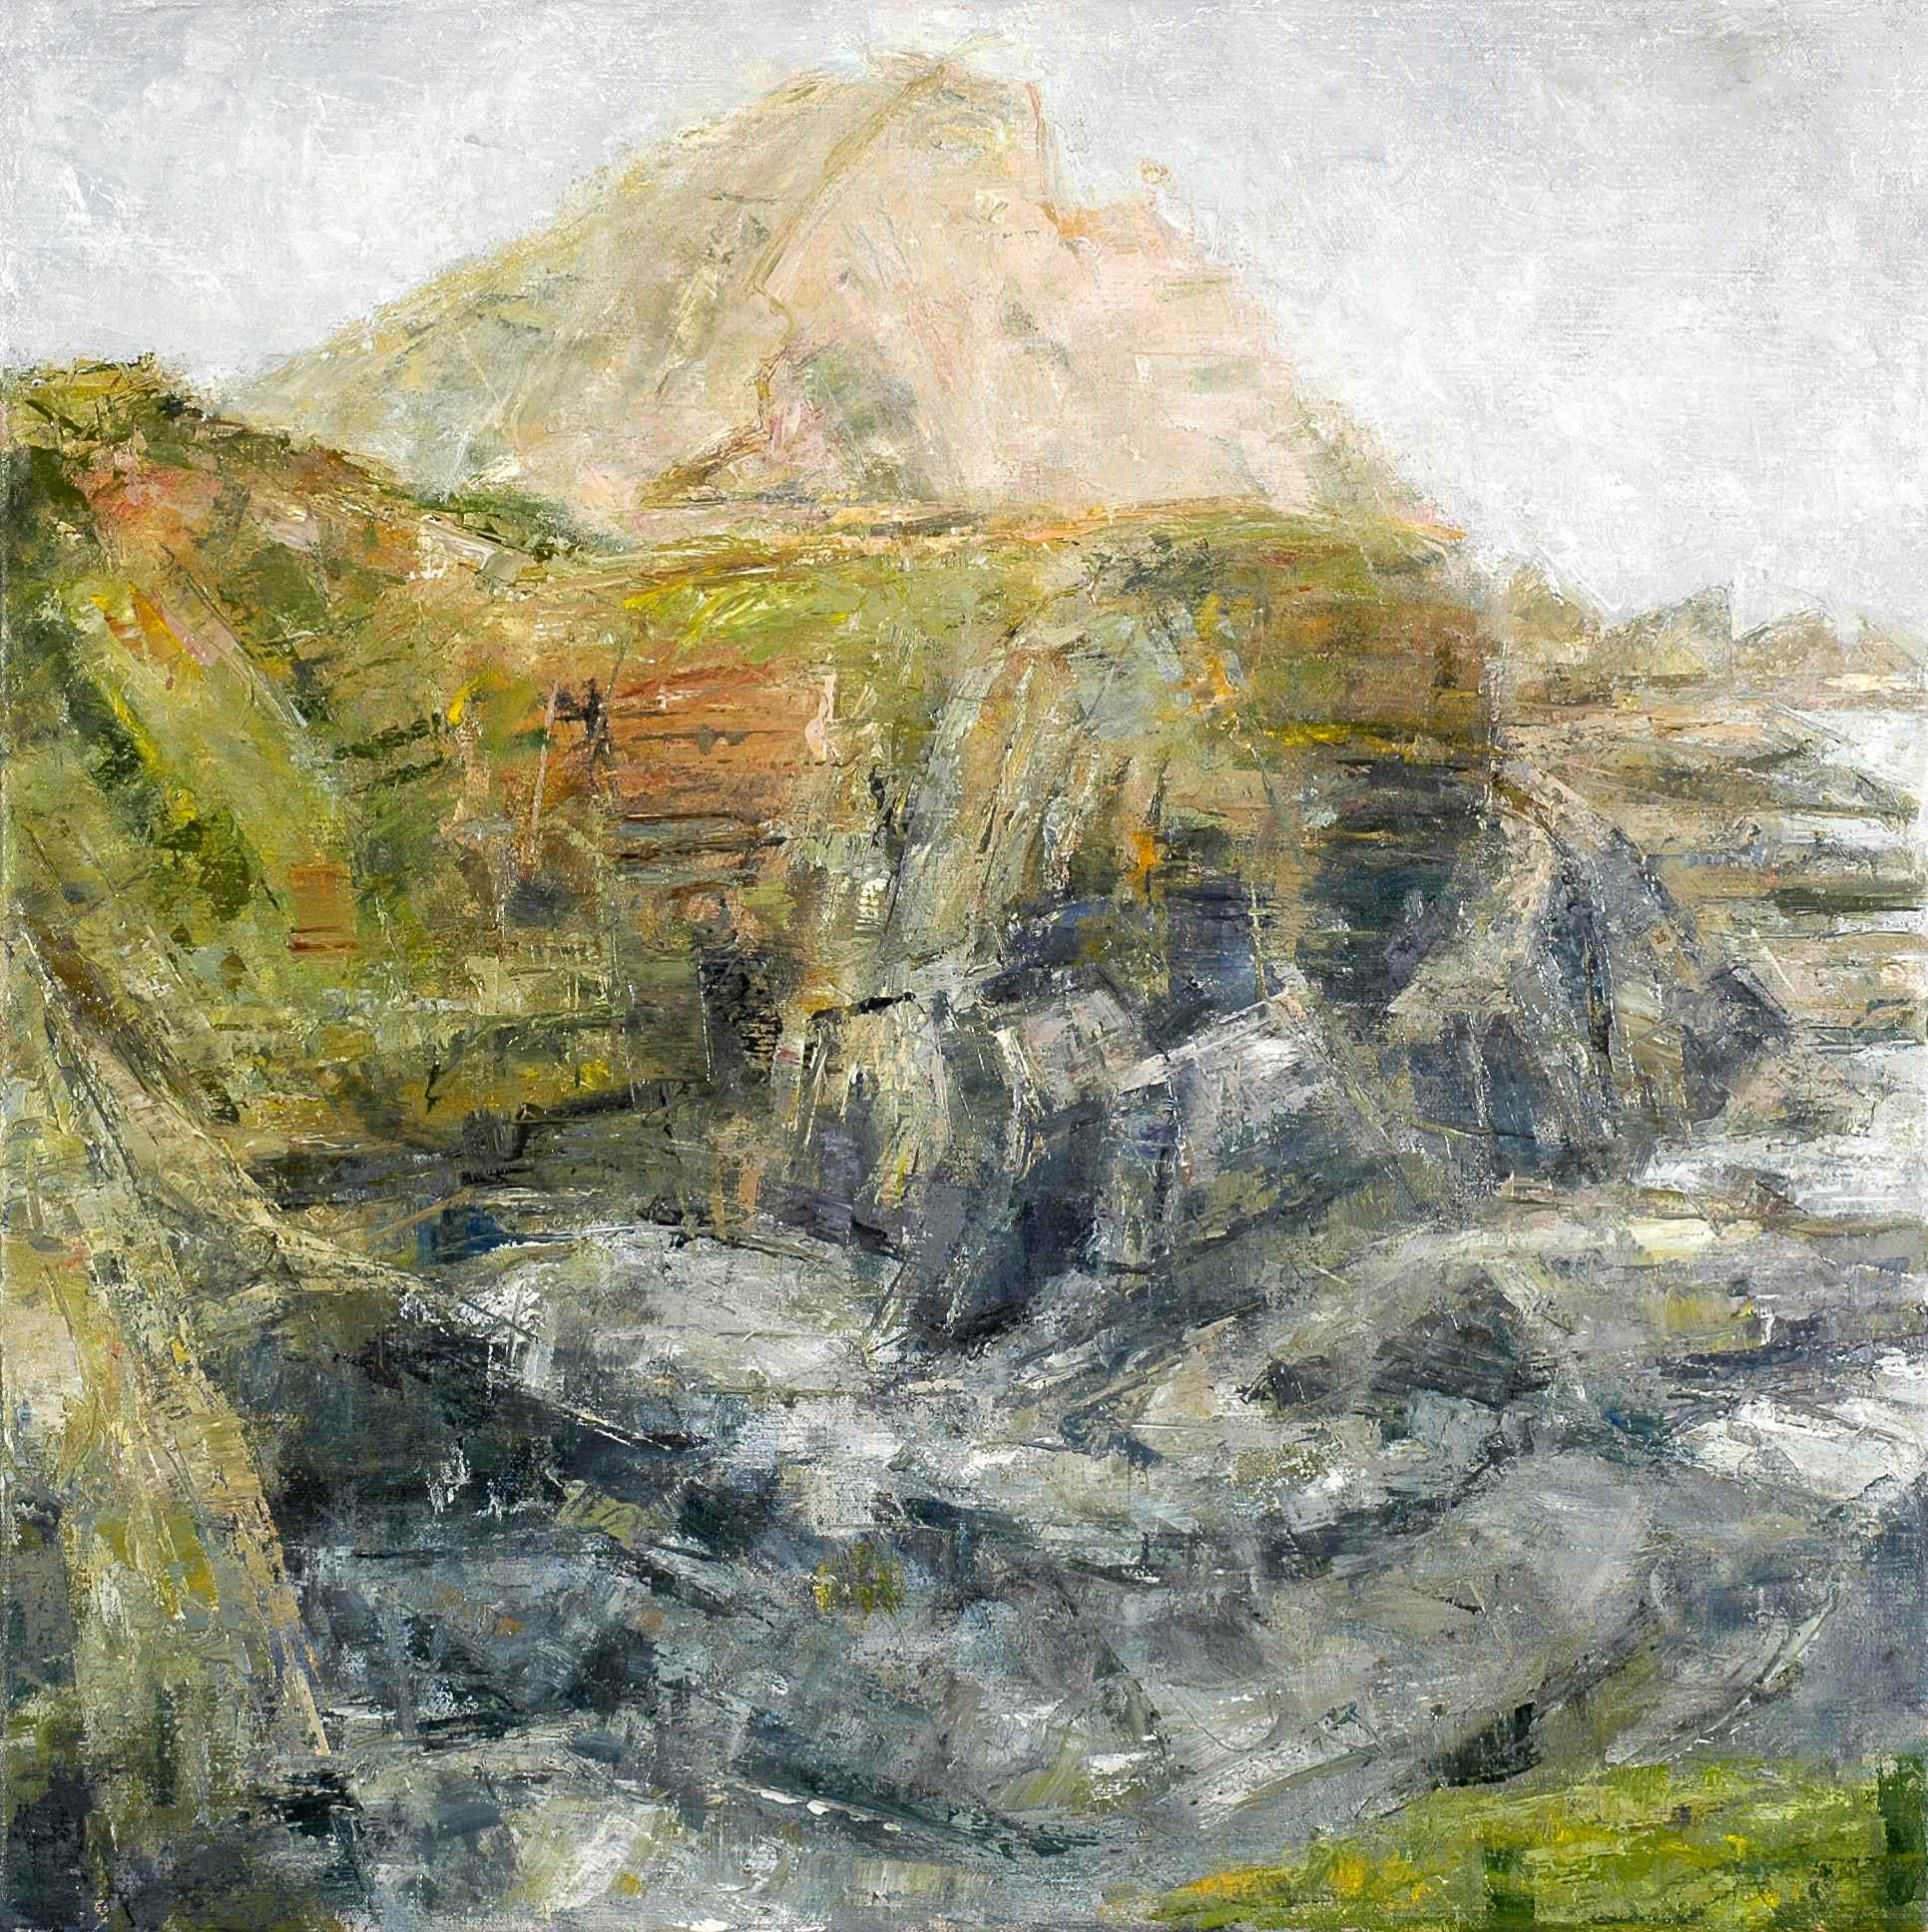 Cliffs - 2006